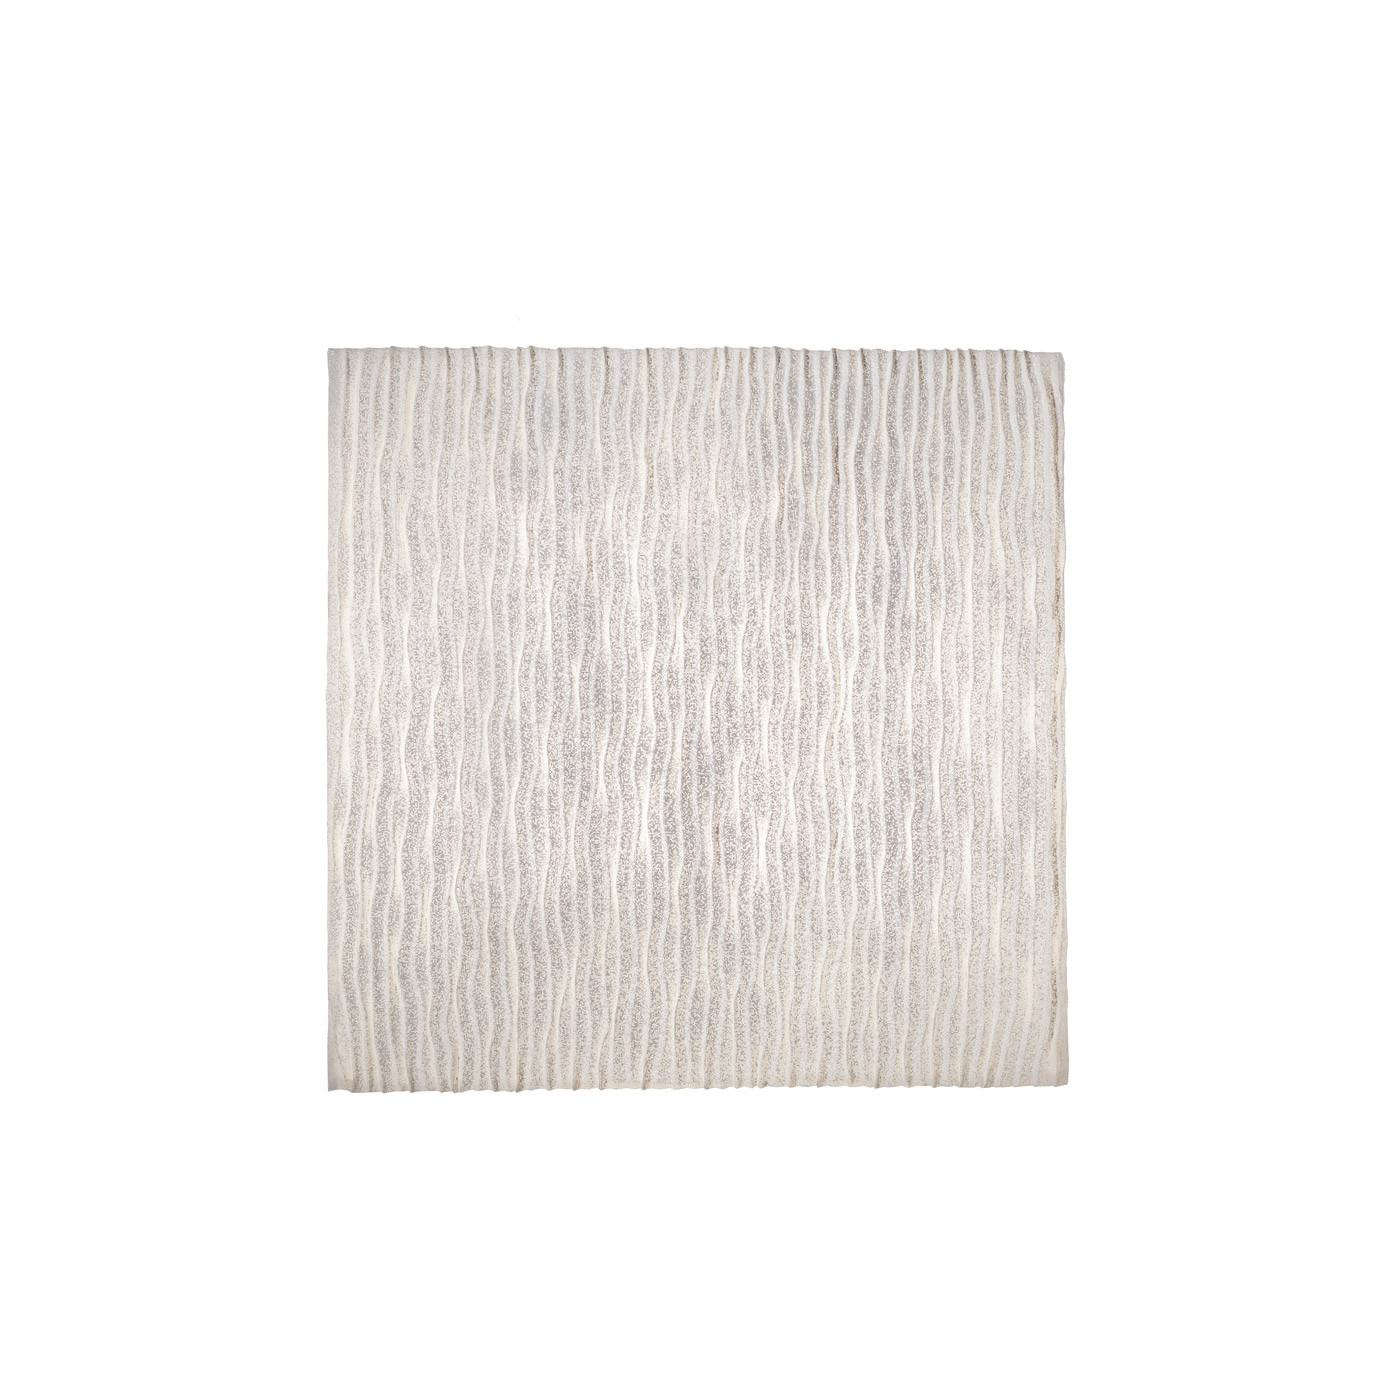 Arturo Alvarez Planum PM06R-LD Wand-/Deckenleuchte